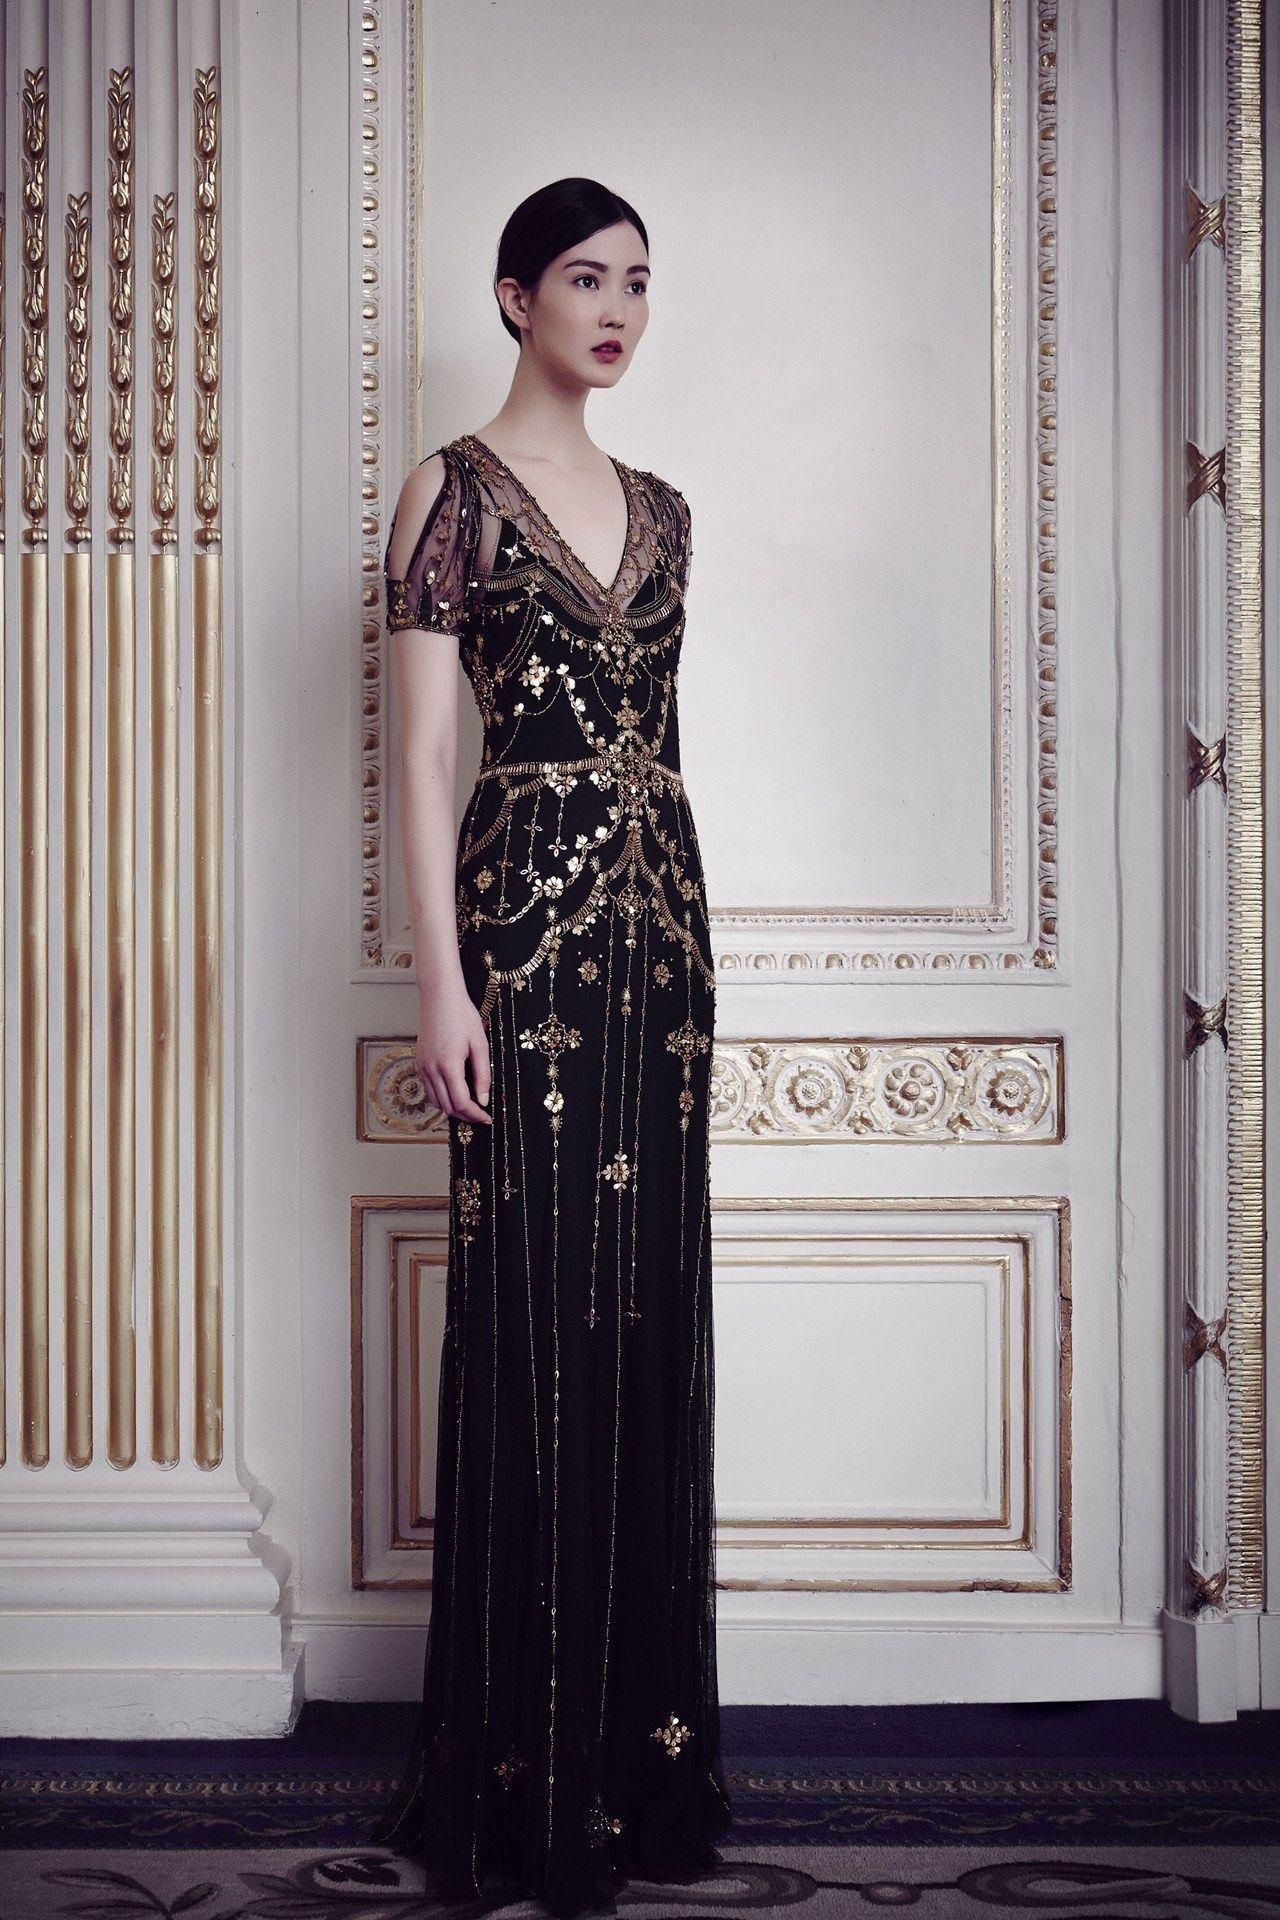 Atemberaubend Jenny Packham Brautjunferkleider 2014 Ideen ...